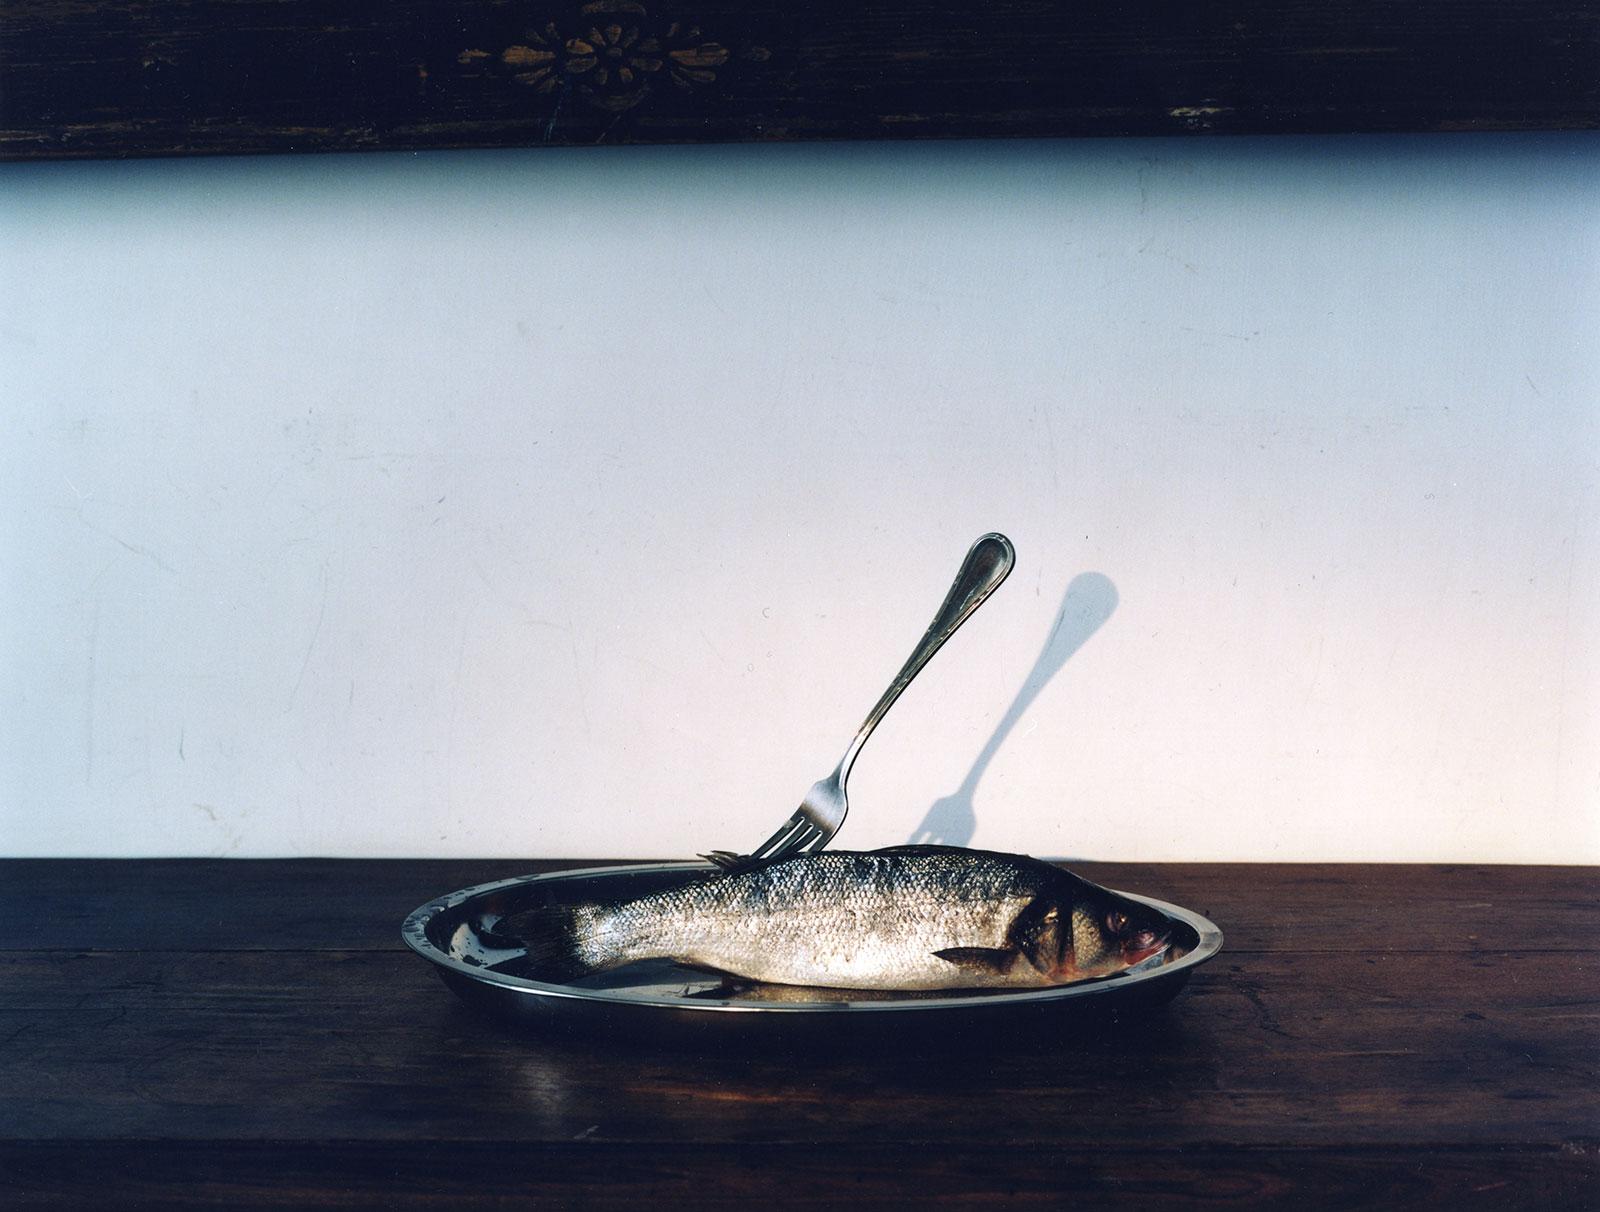 Fish, 2013/2015, C-print, 45,5 x 60 cm, ed. 5